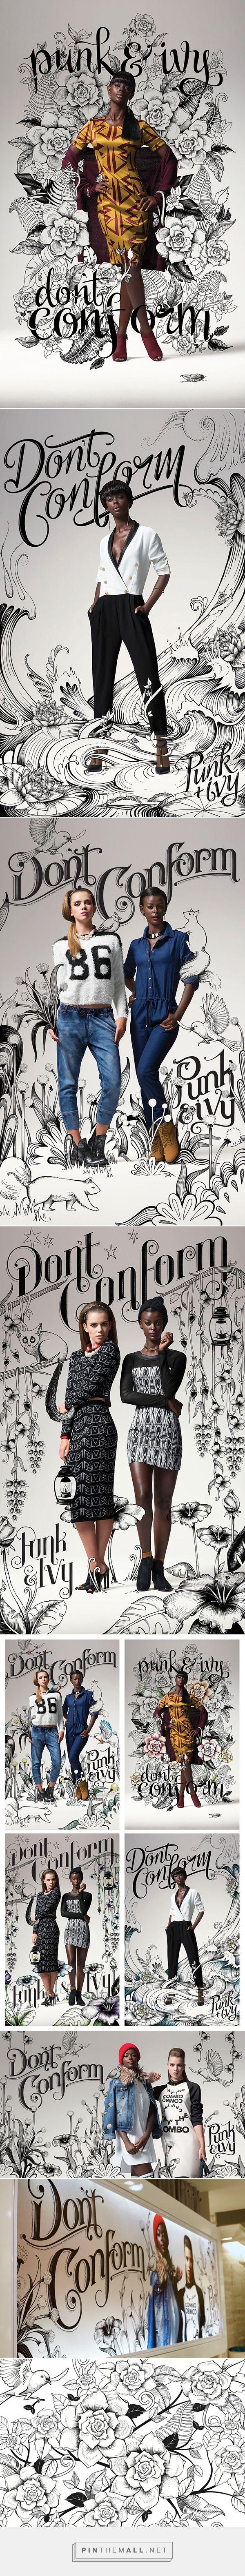 LEGiT Don't Conform Campaign on SCAD Portfolios - Dani Loureiro